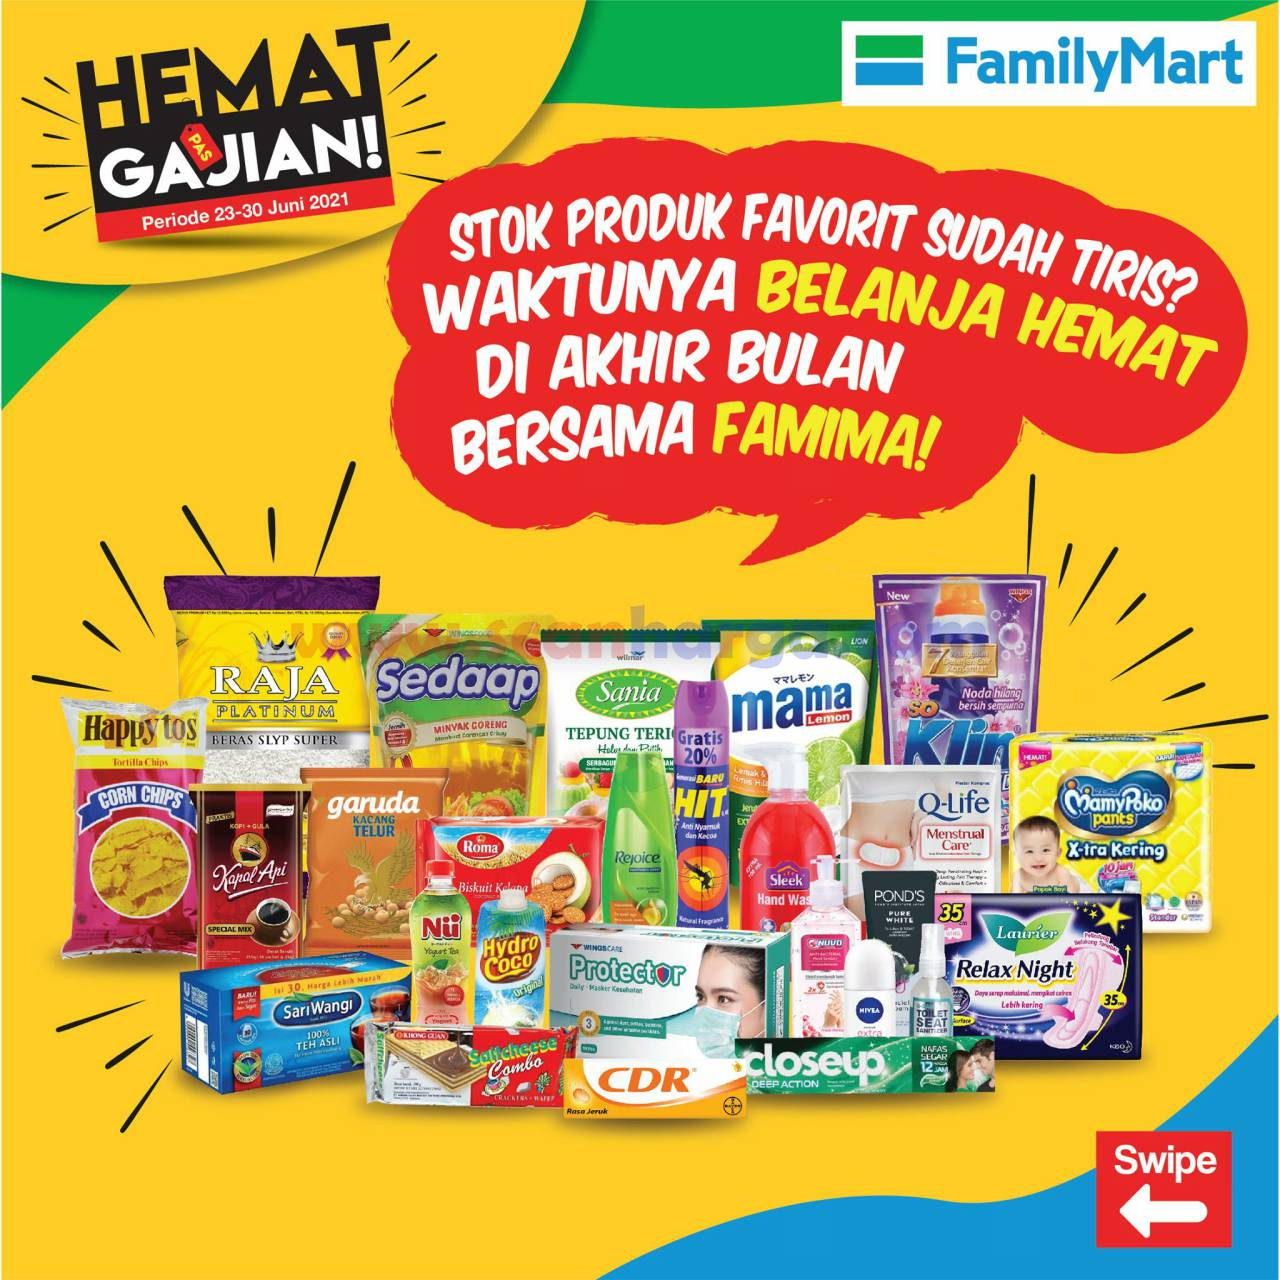 Katalog Promo Family Mart Hemat Pas Gajian 23 - 30 Juni 2021